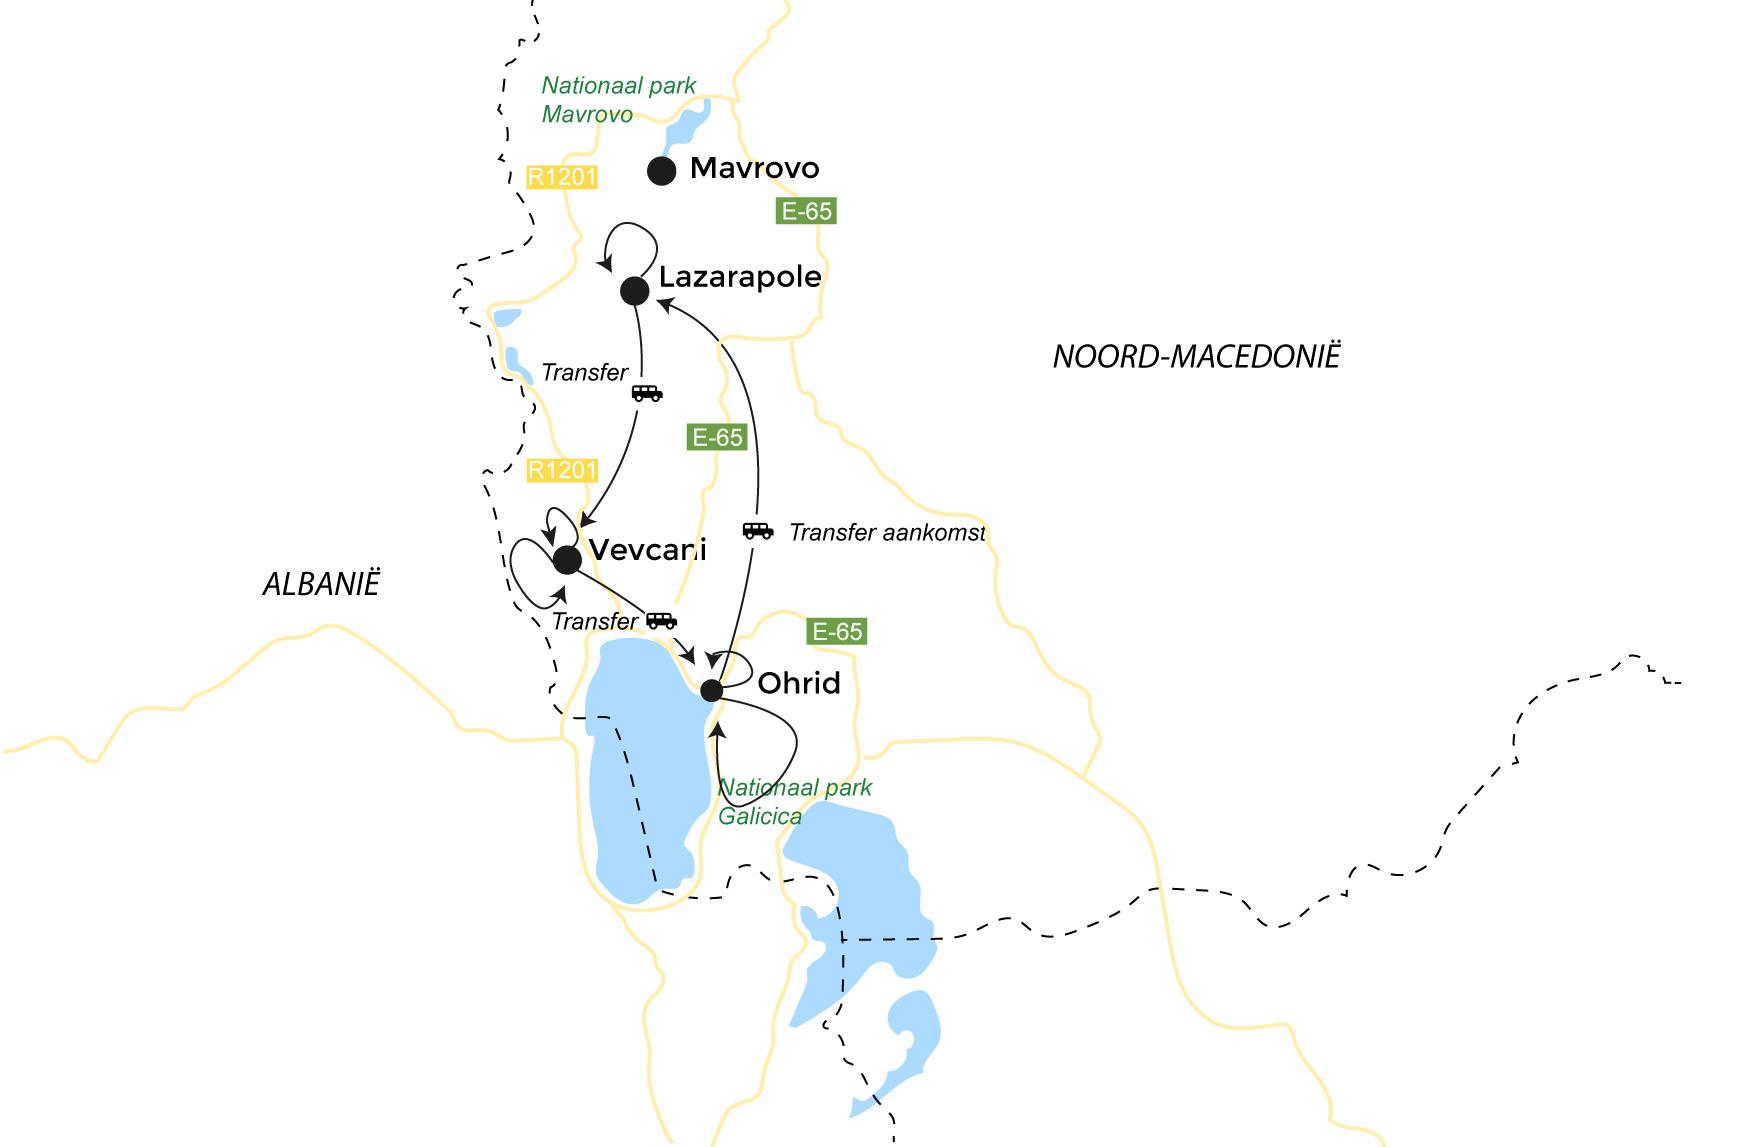 Routekaart Karische kust